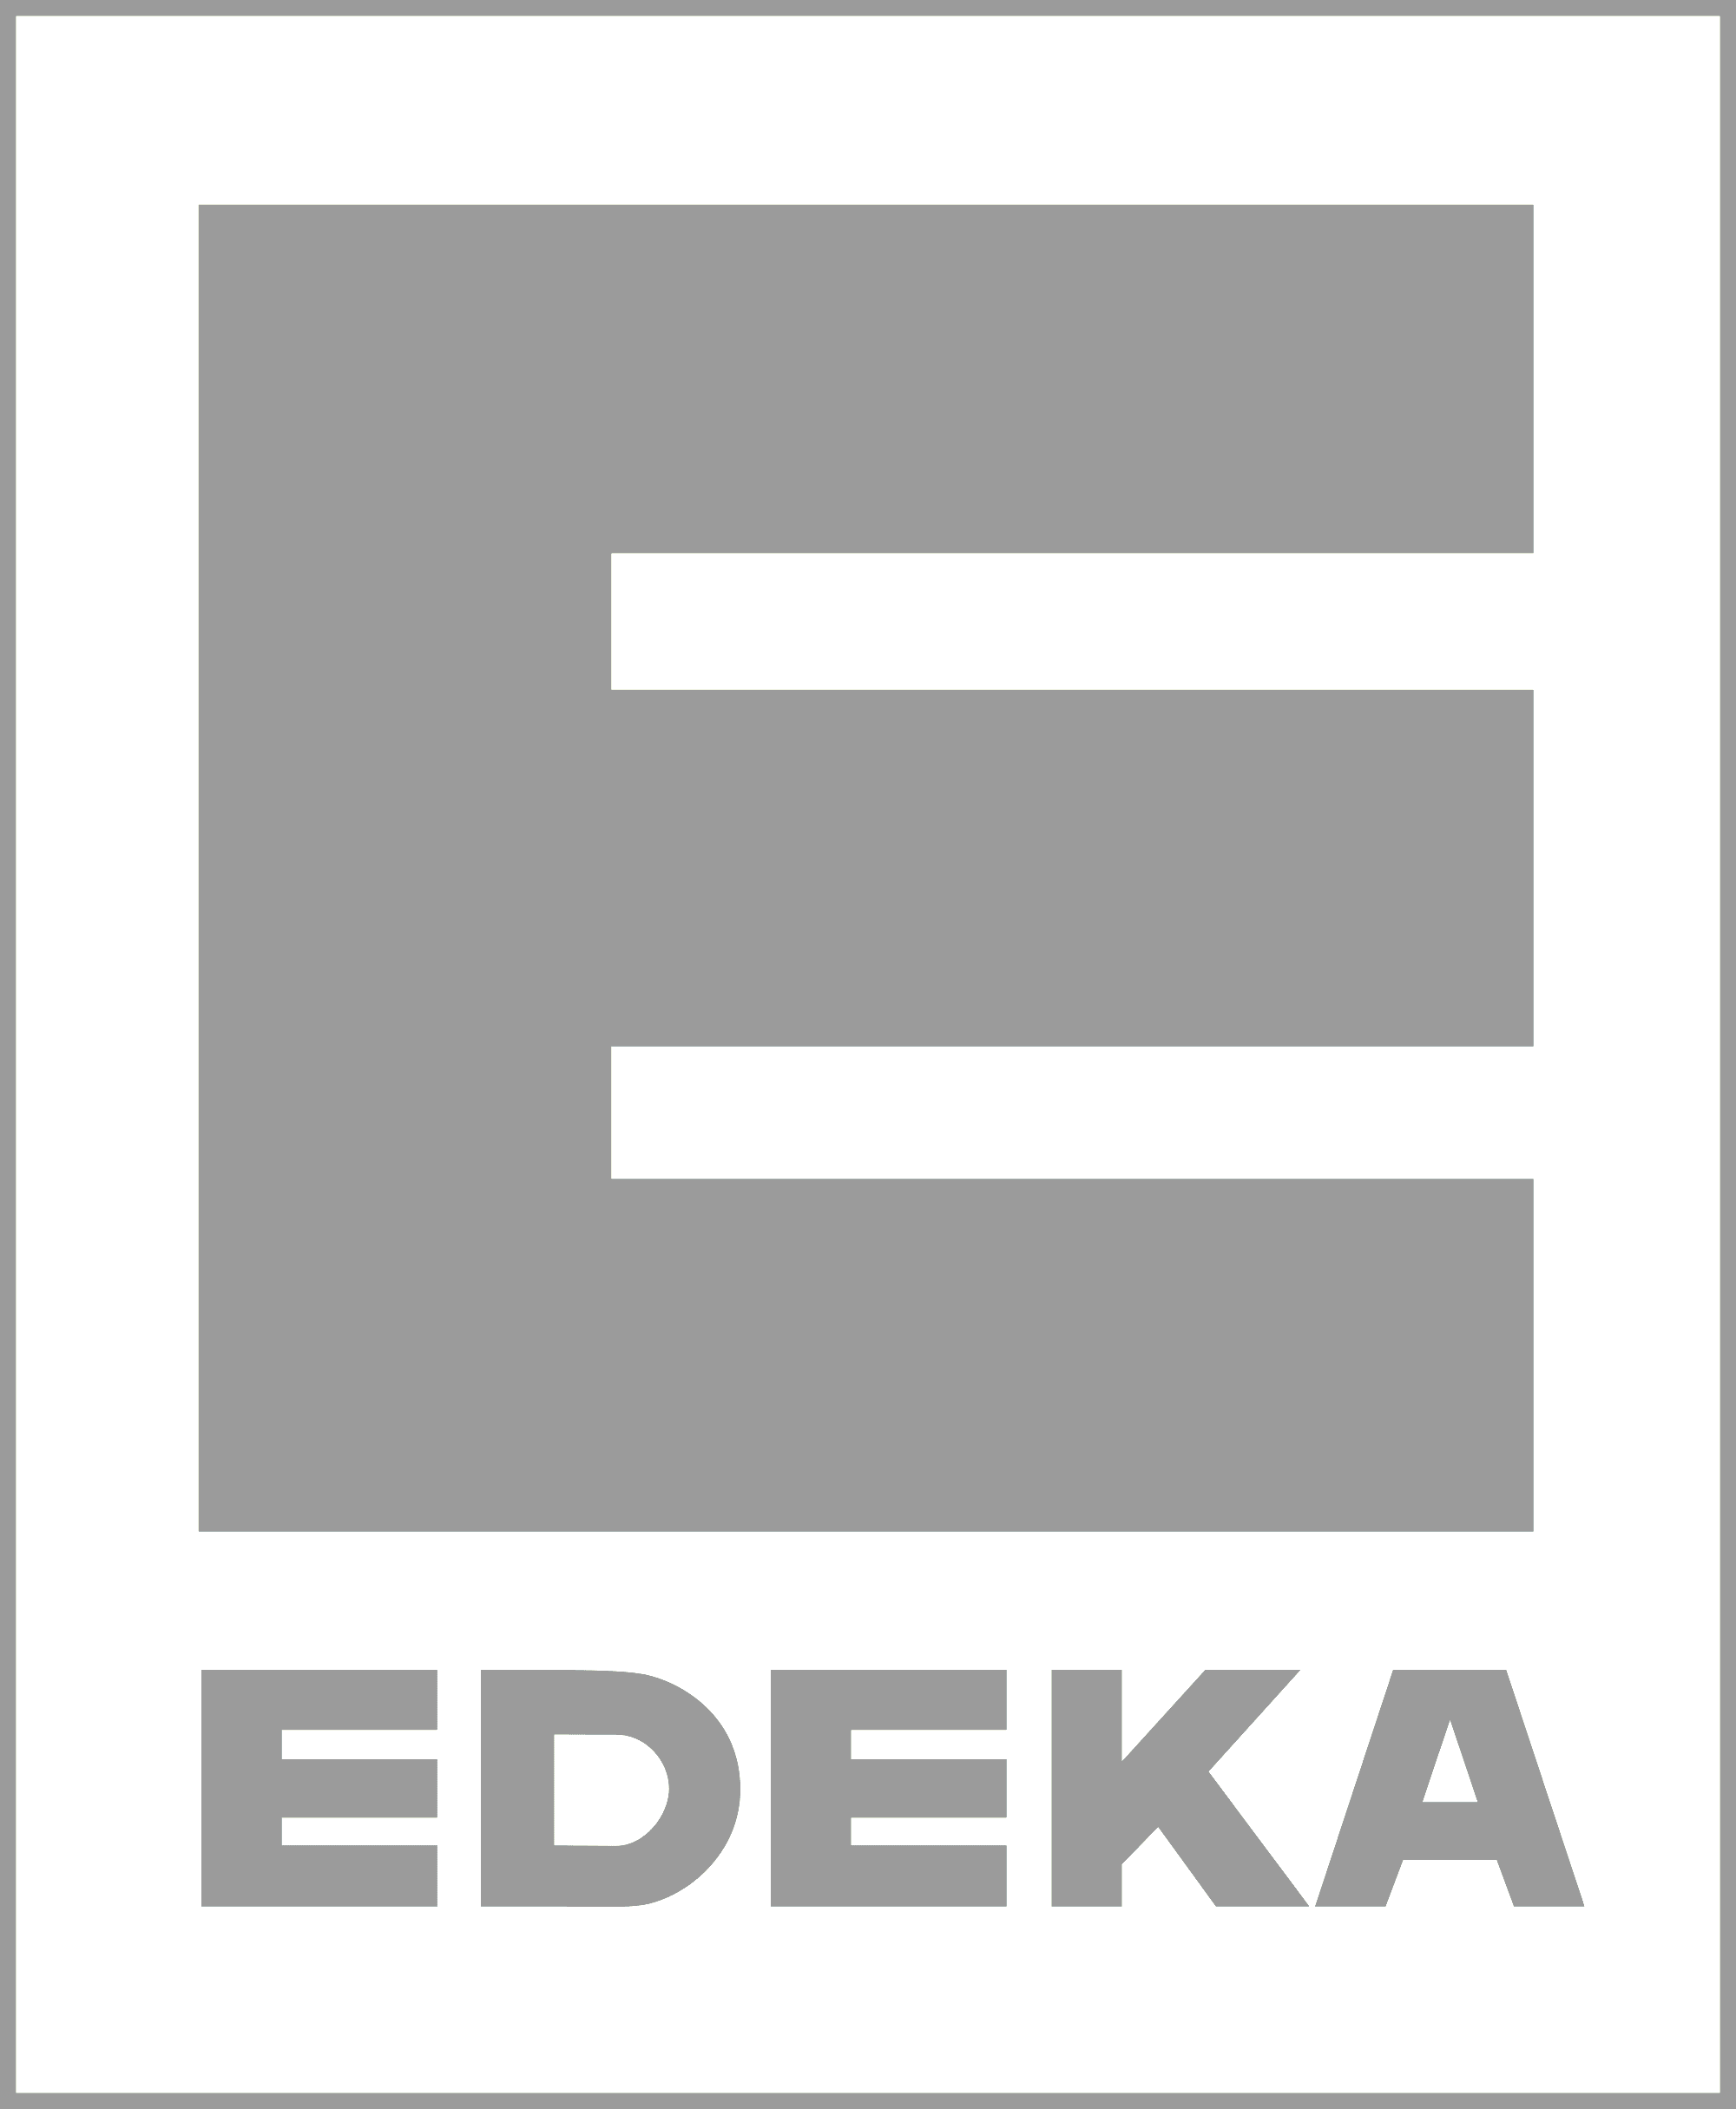 Edeka Logo in Grey